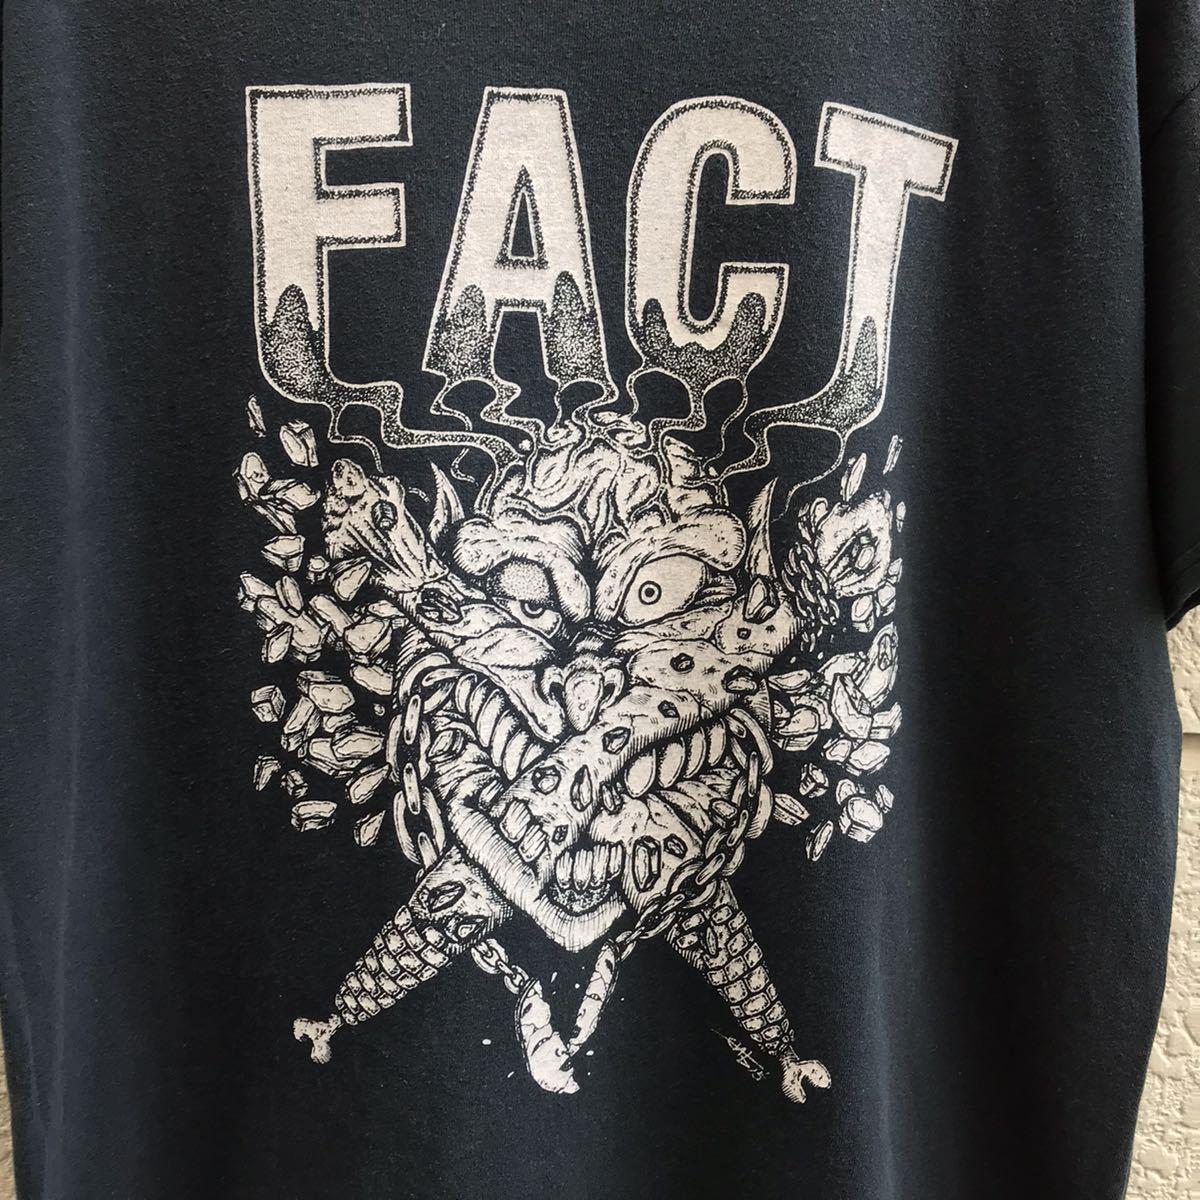 FACT バンドTシャツ 古着 ロックTシャツ